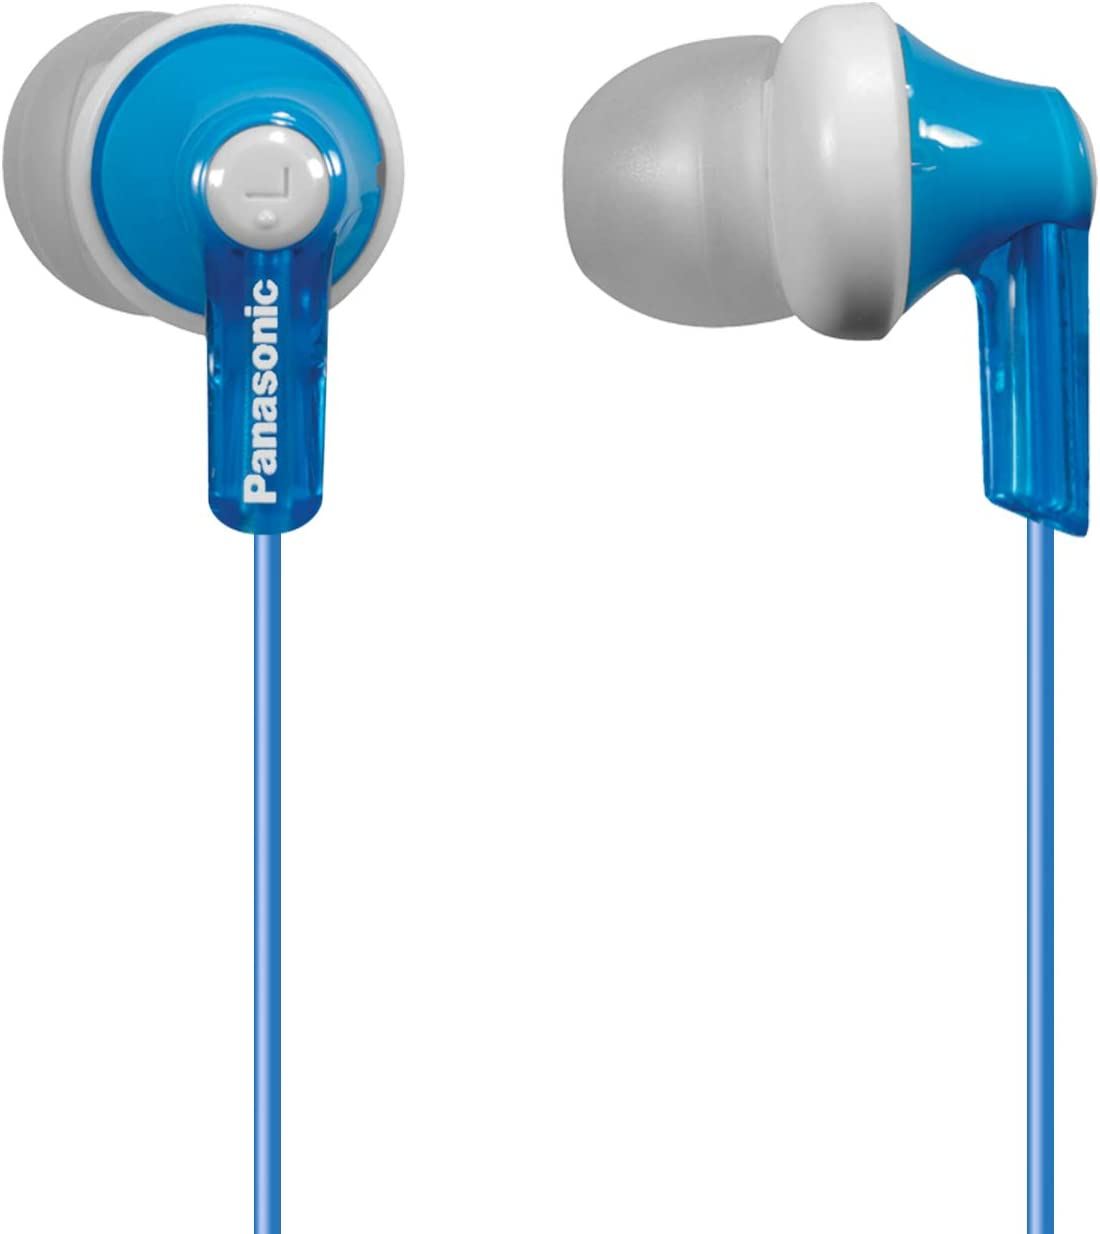 Panasonic ErgoFit in-Ear Earbud Headphones RP-HJE120-AA Metallic Blue Dynamic Crystal-Clear Sound Ergonomic Comfort-Fit